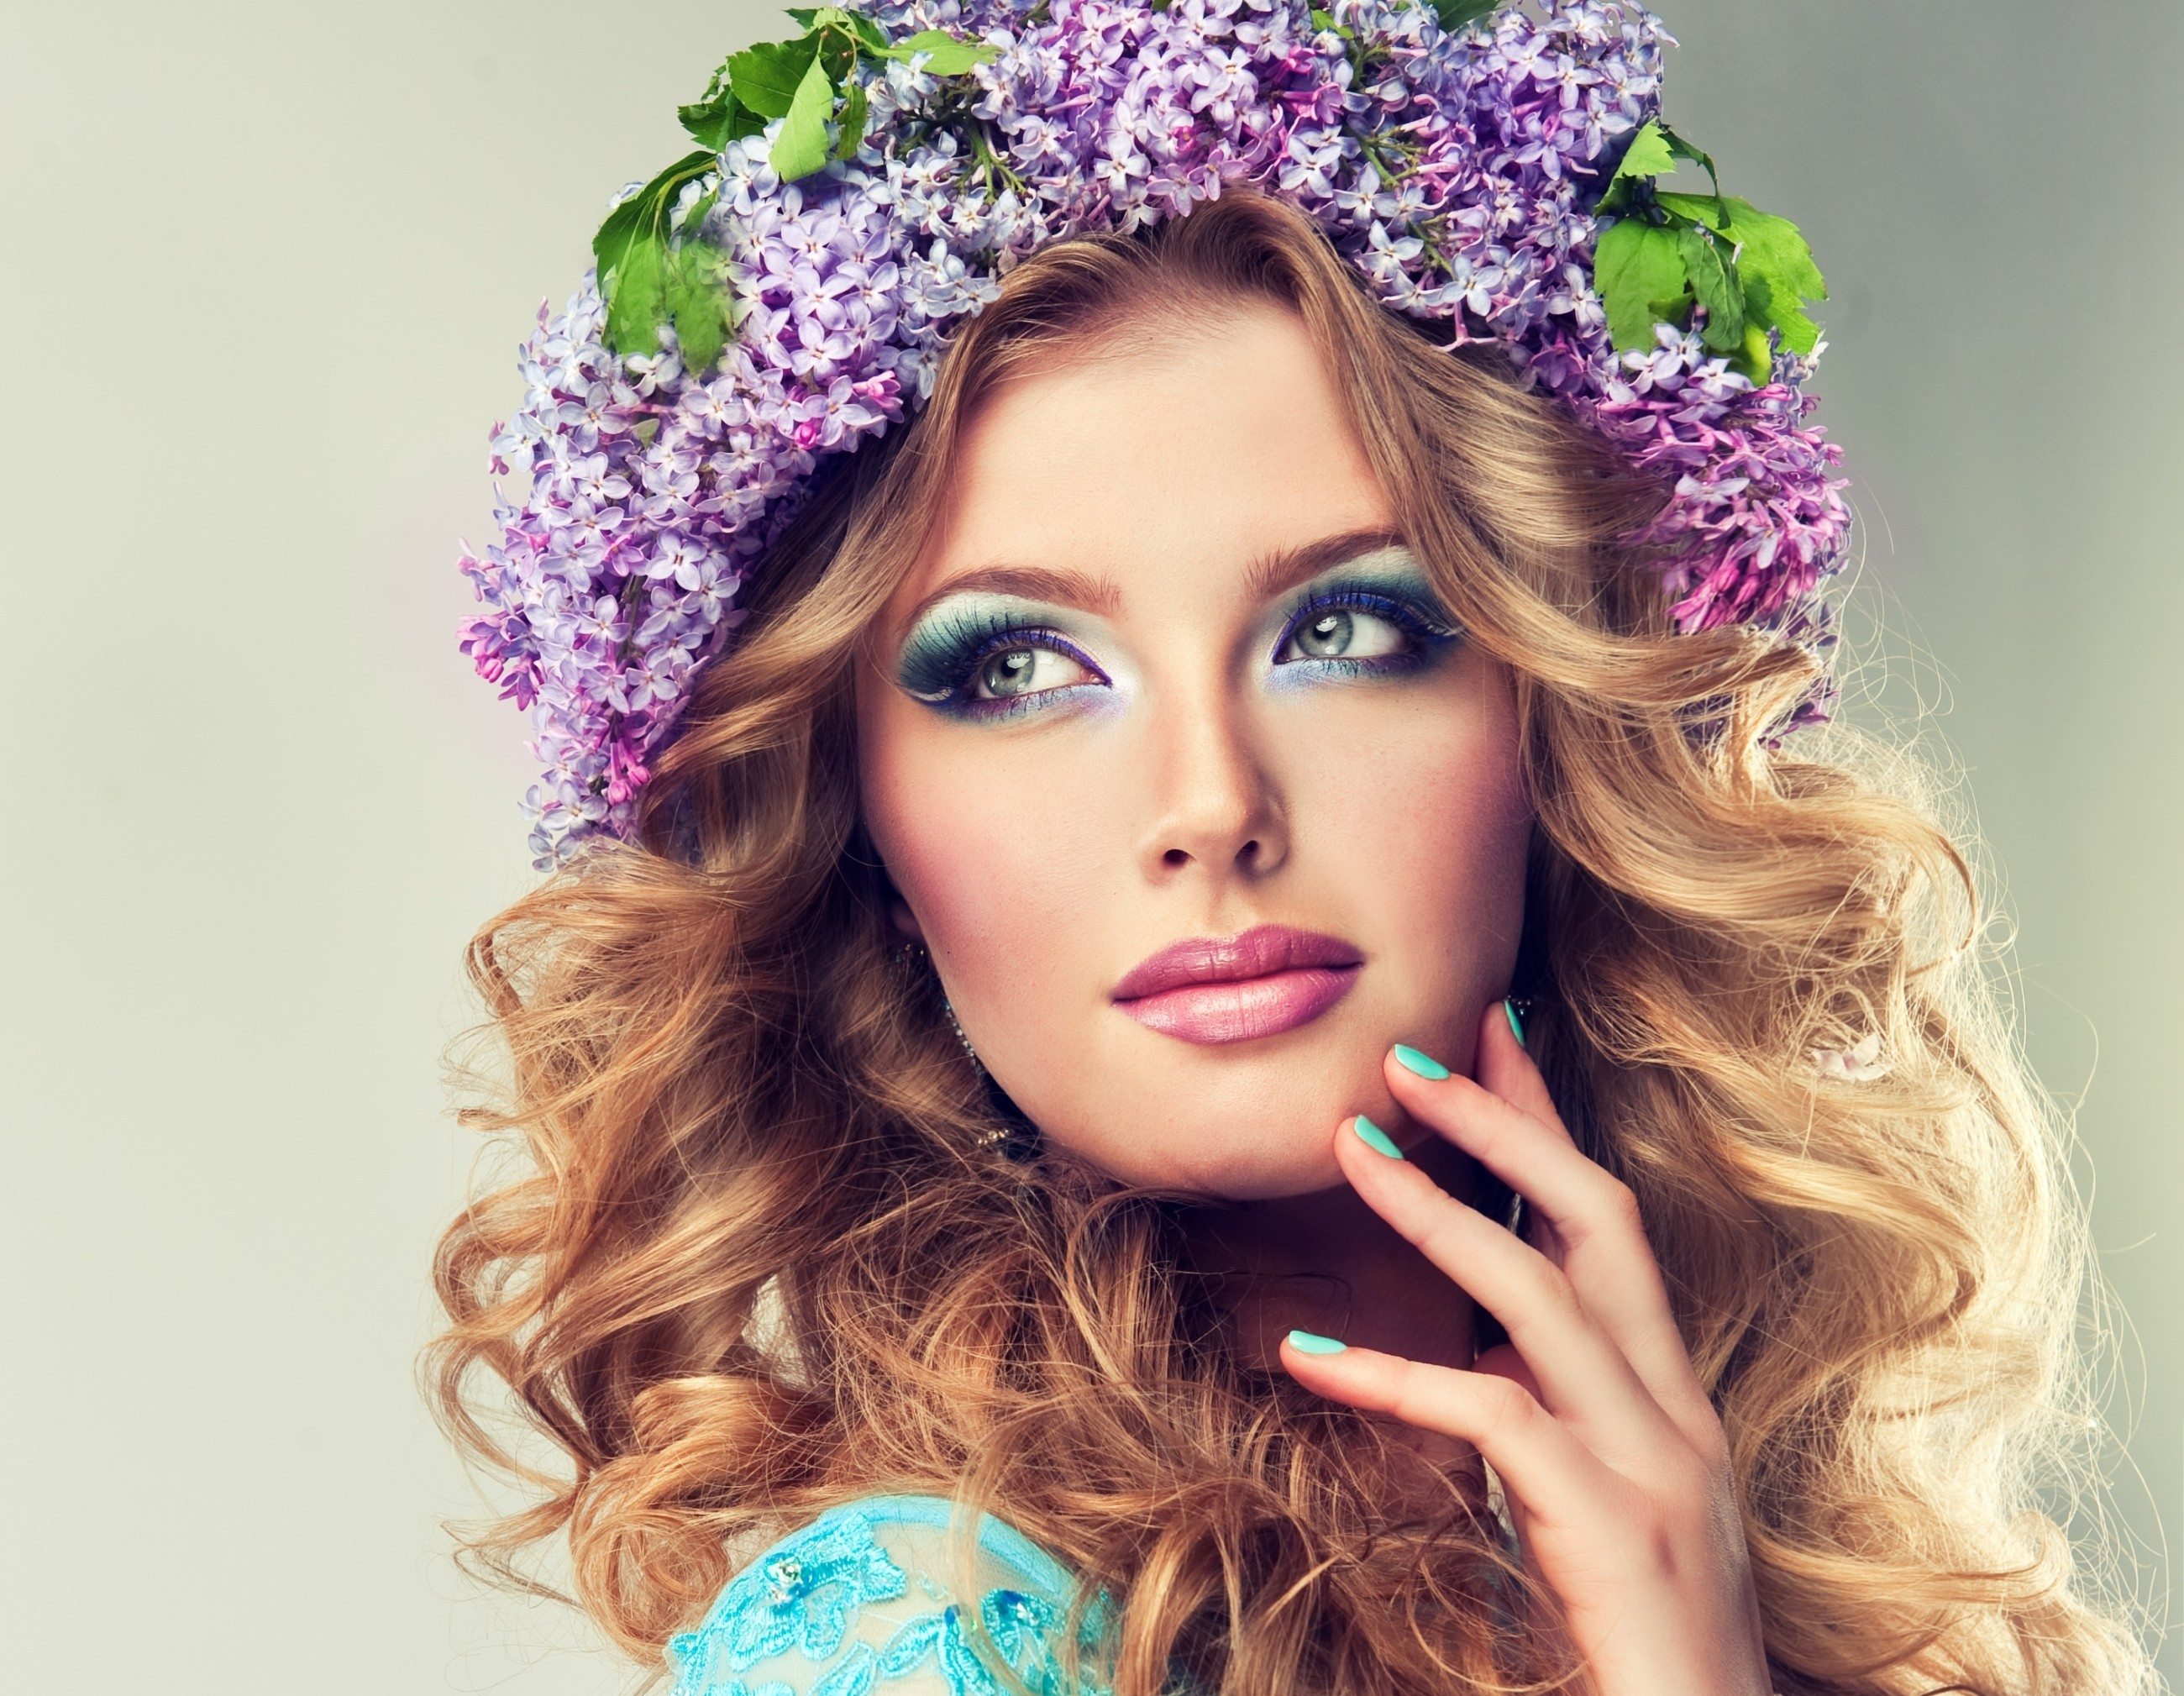 Beautiful Girl Face Hd Wallpaper Beautiful Model Of Flowers Lilac With Curly Long Hair Hd